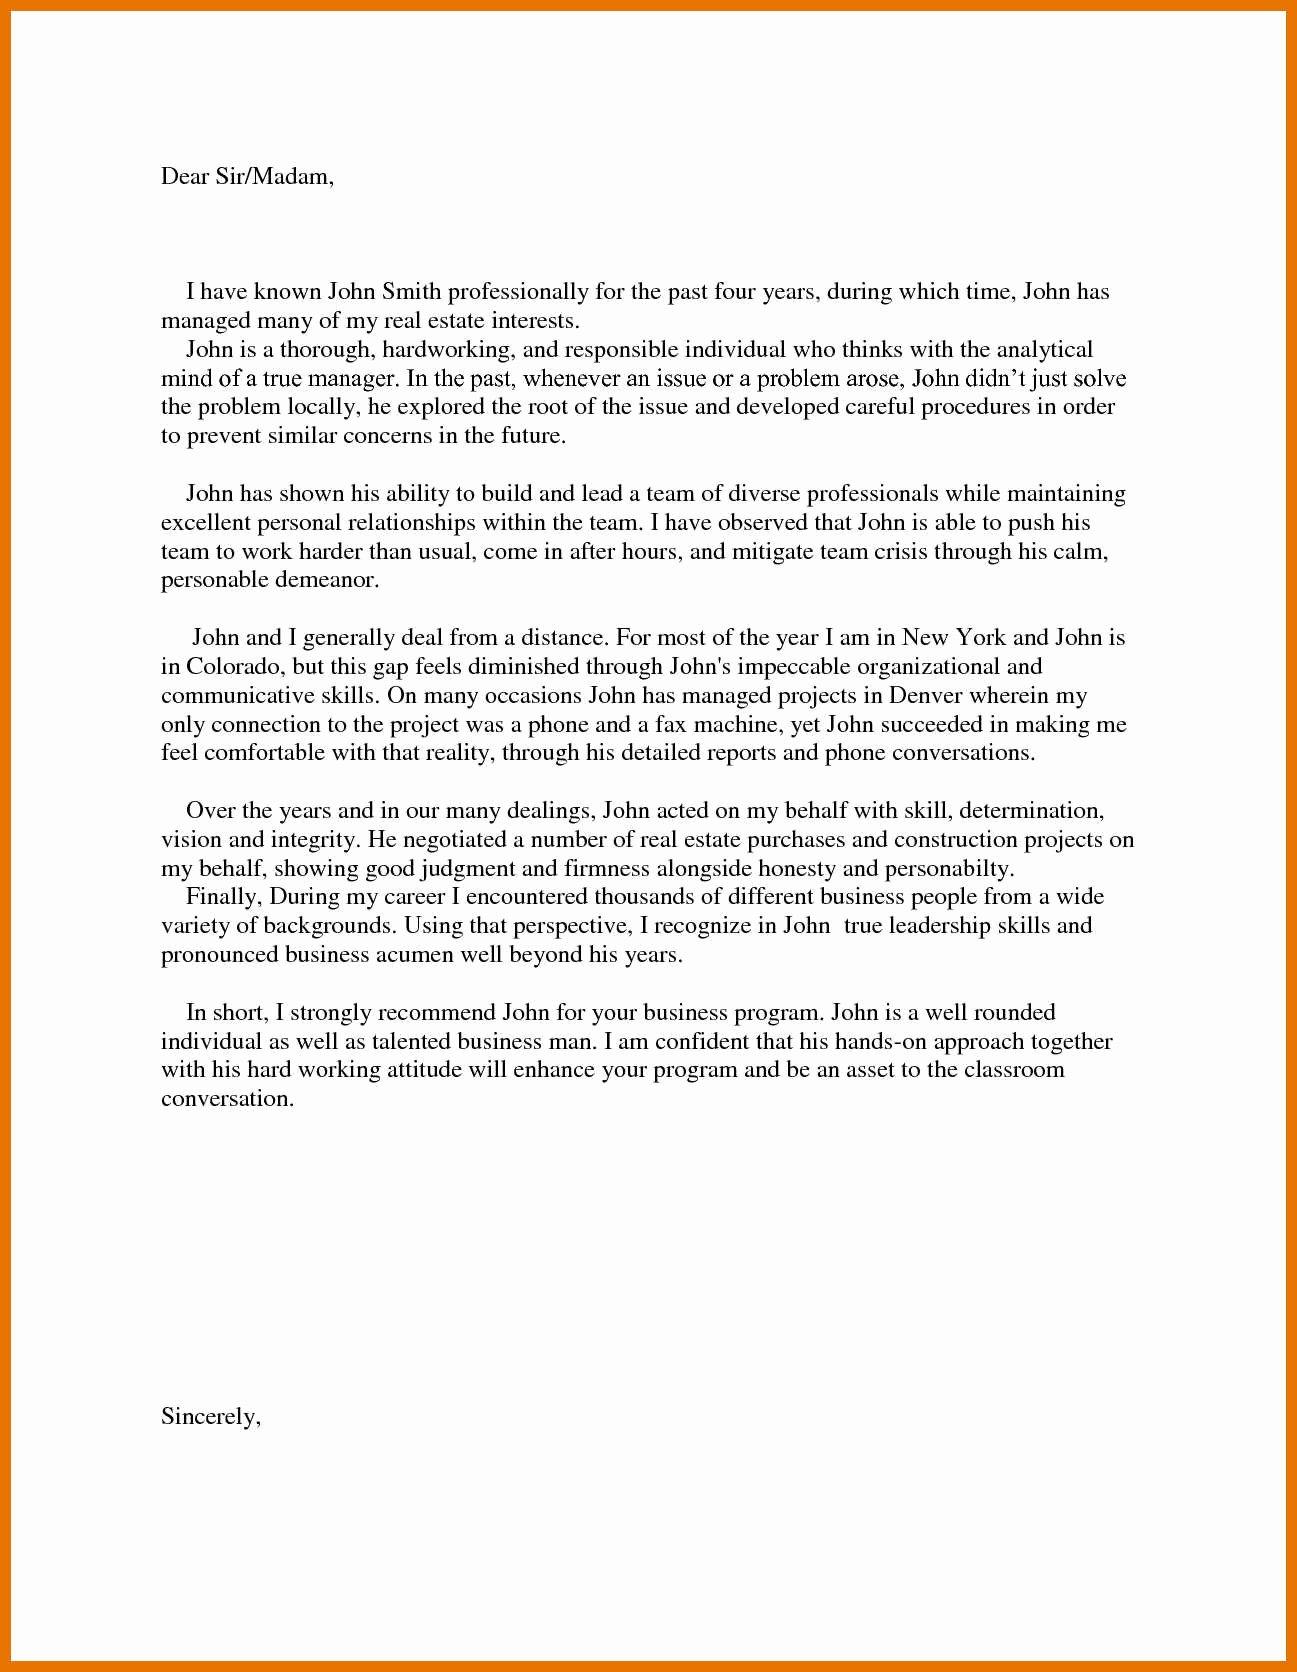 Business School Recommendation Letter Unique 5 6 Mba Letter Of Re Mendation Sample